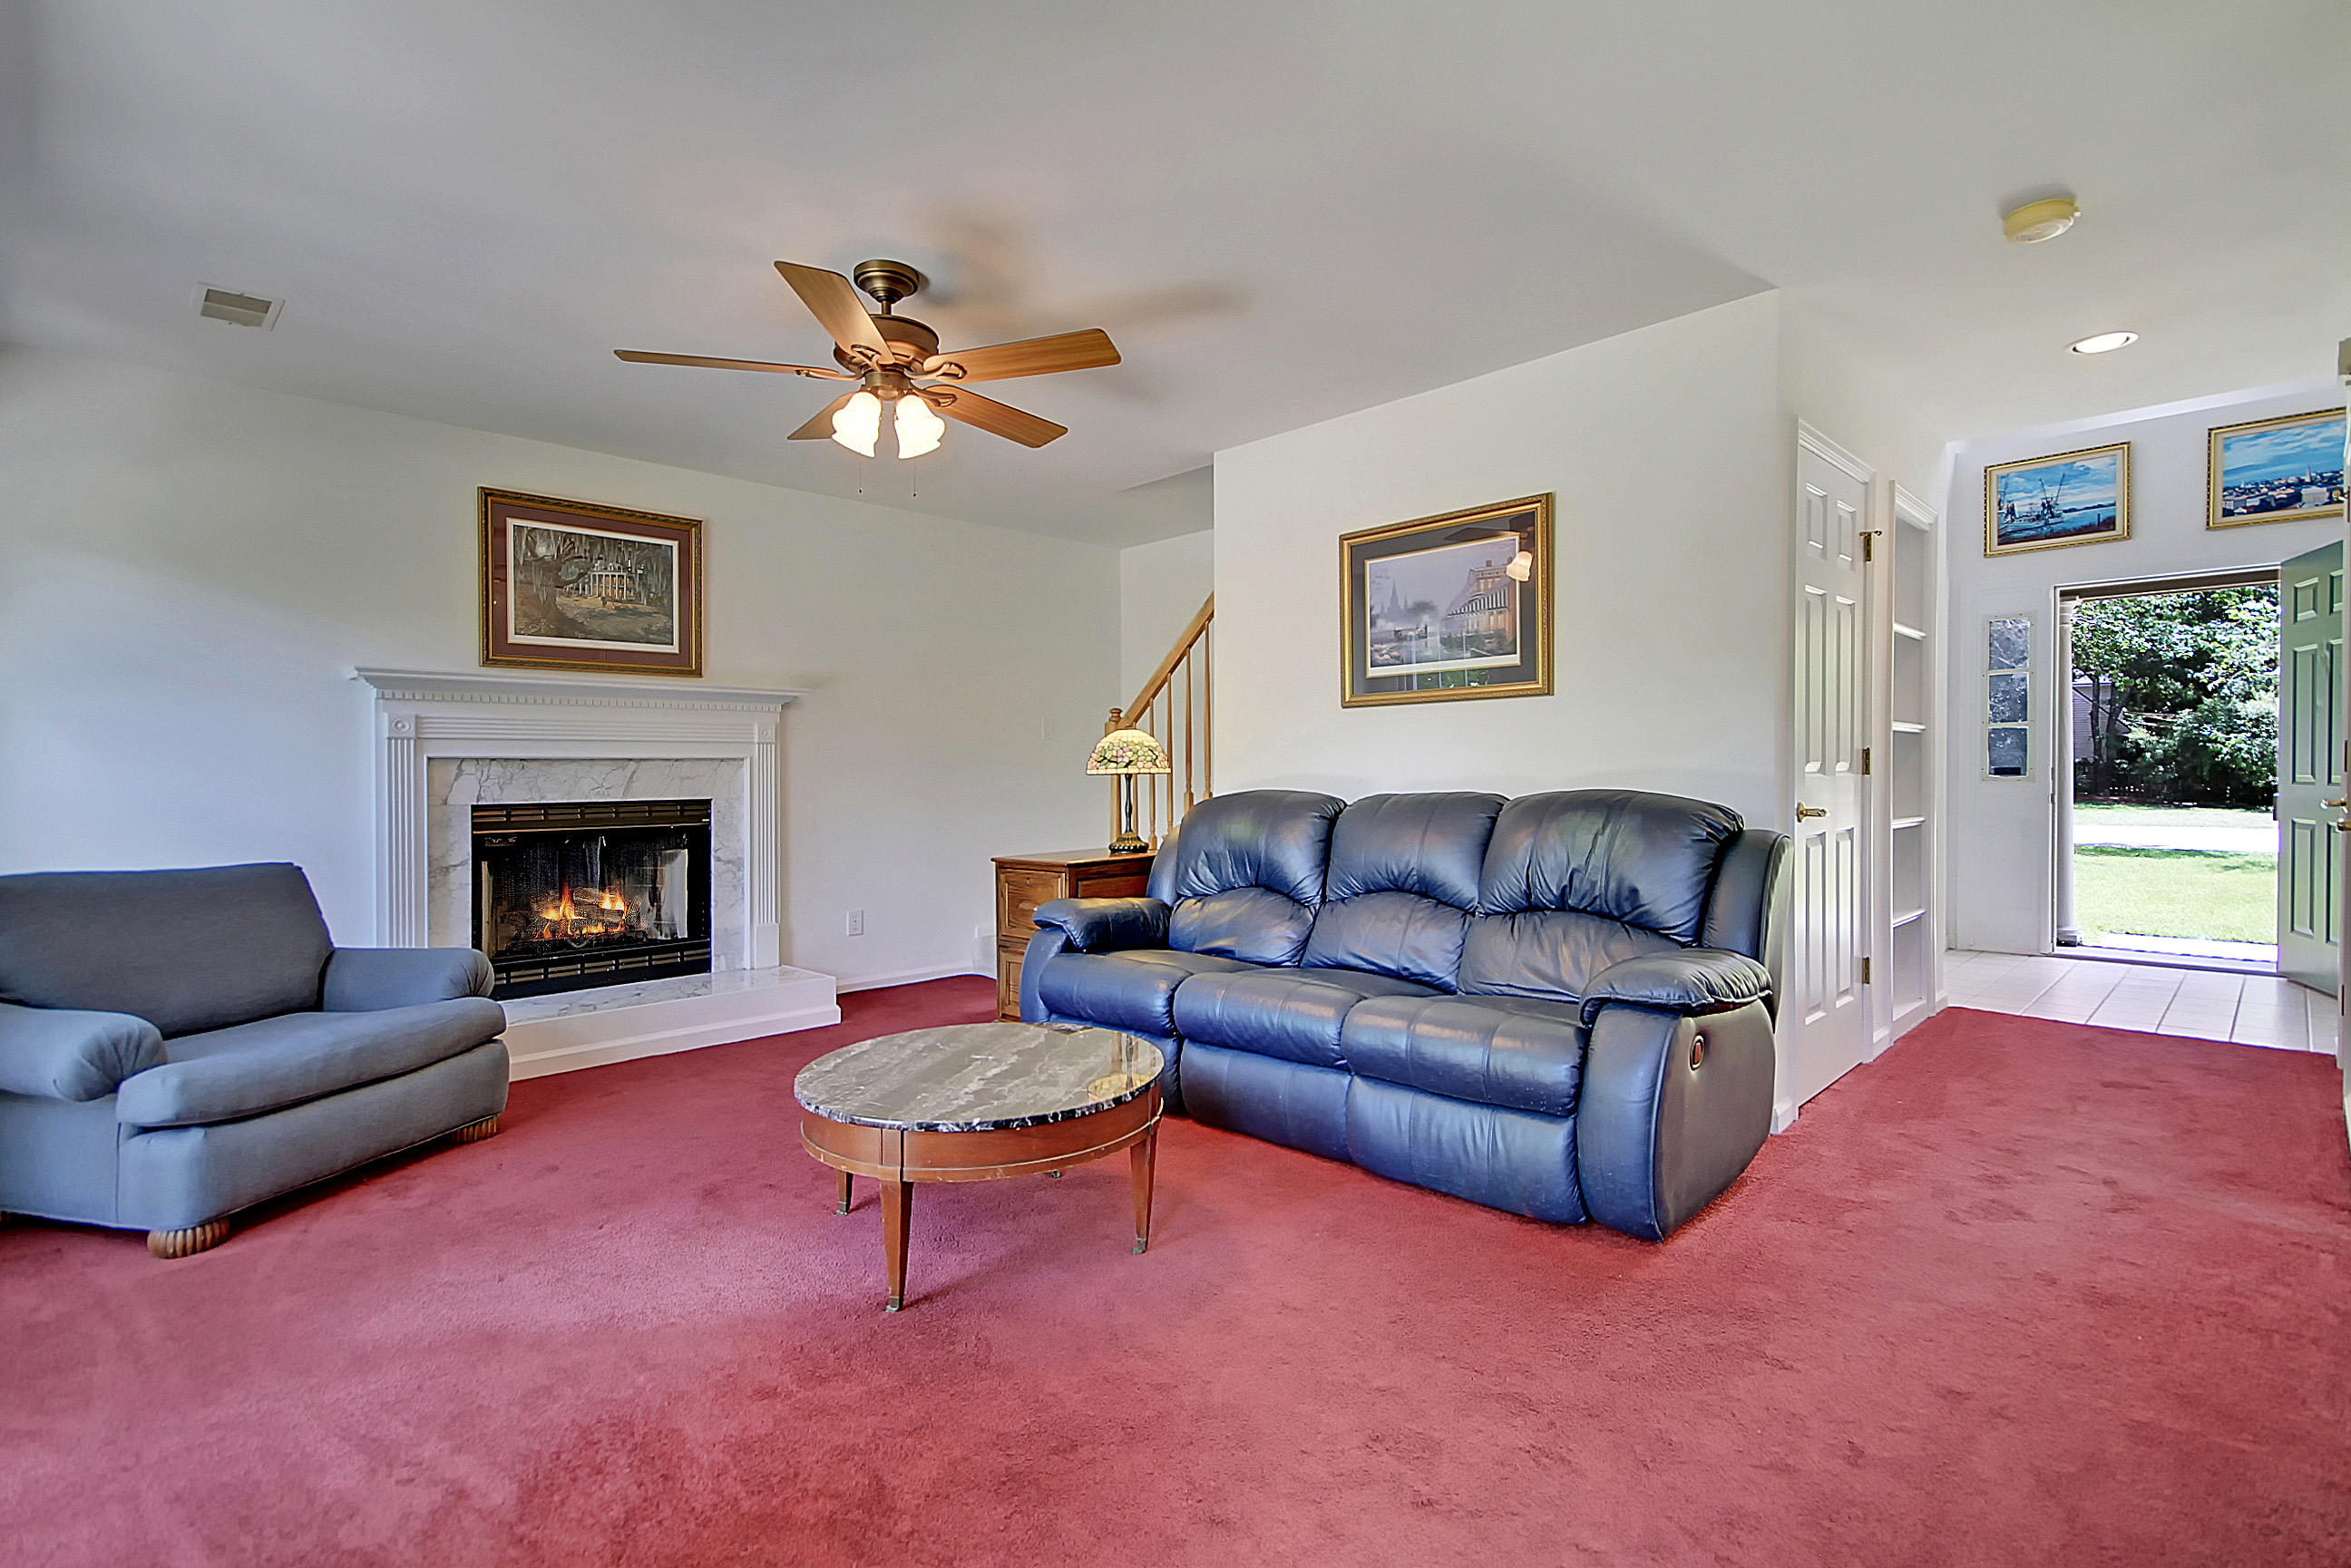 Center Lake Homes For Sale - 1252 Center Lake, Mount Pleasant, SC - 26